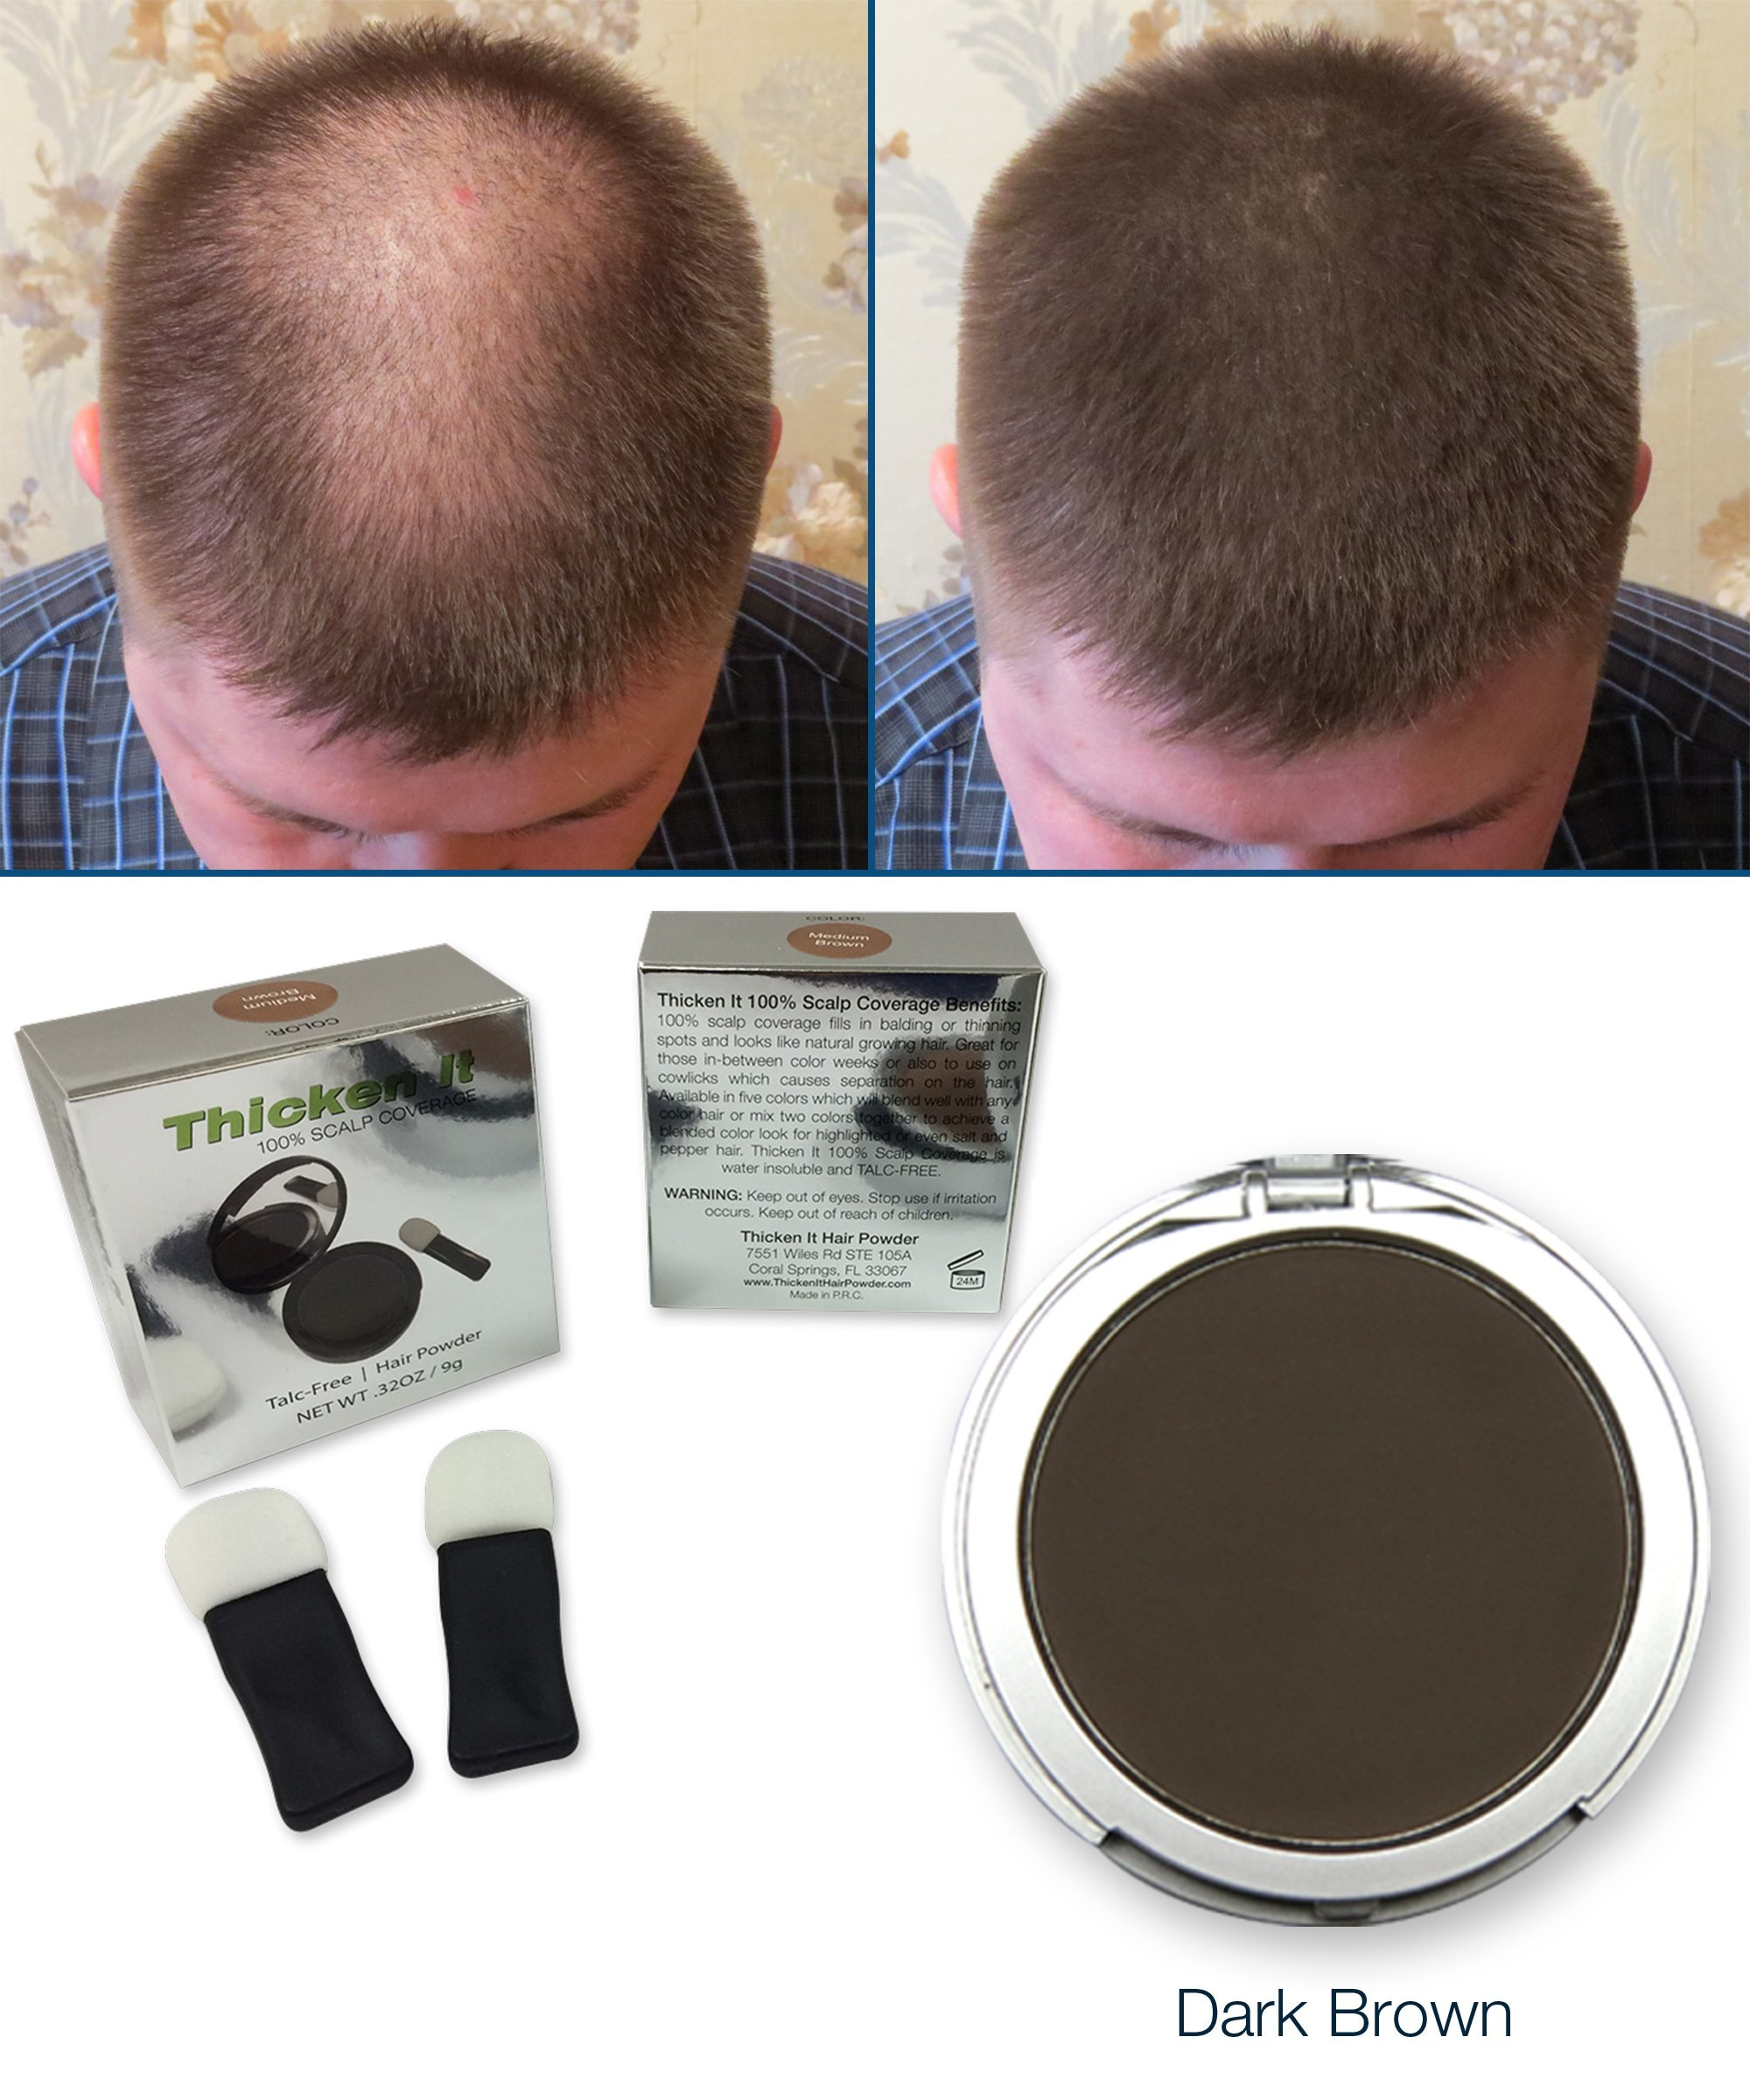 Amazon Dermmatch Waterproof Hair Loss Concealer Naturally